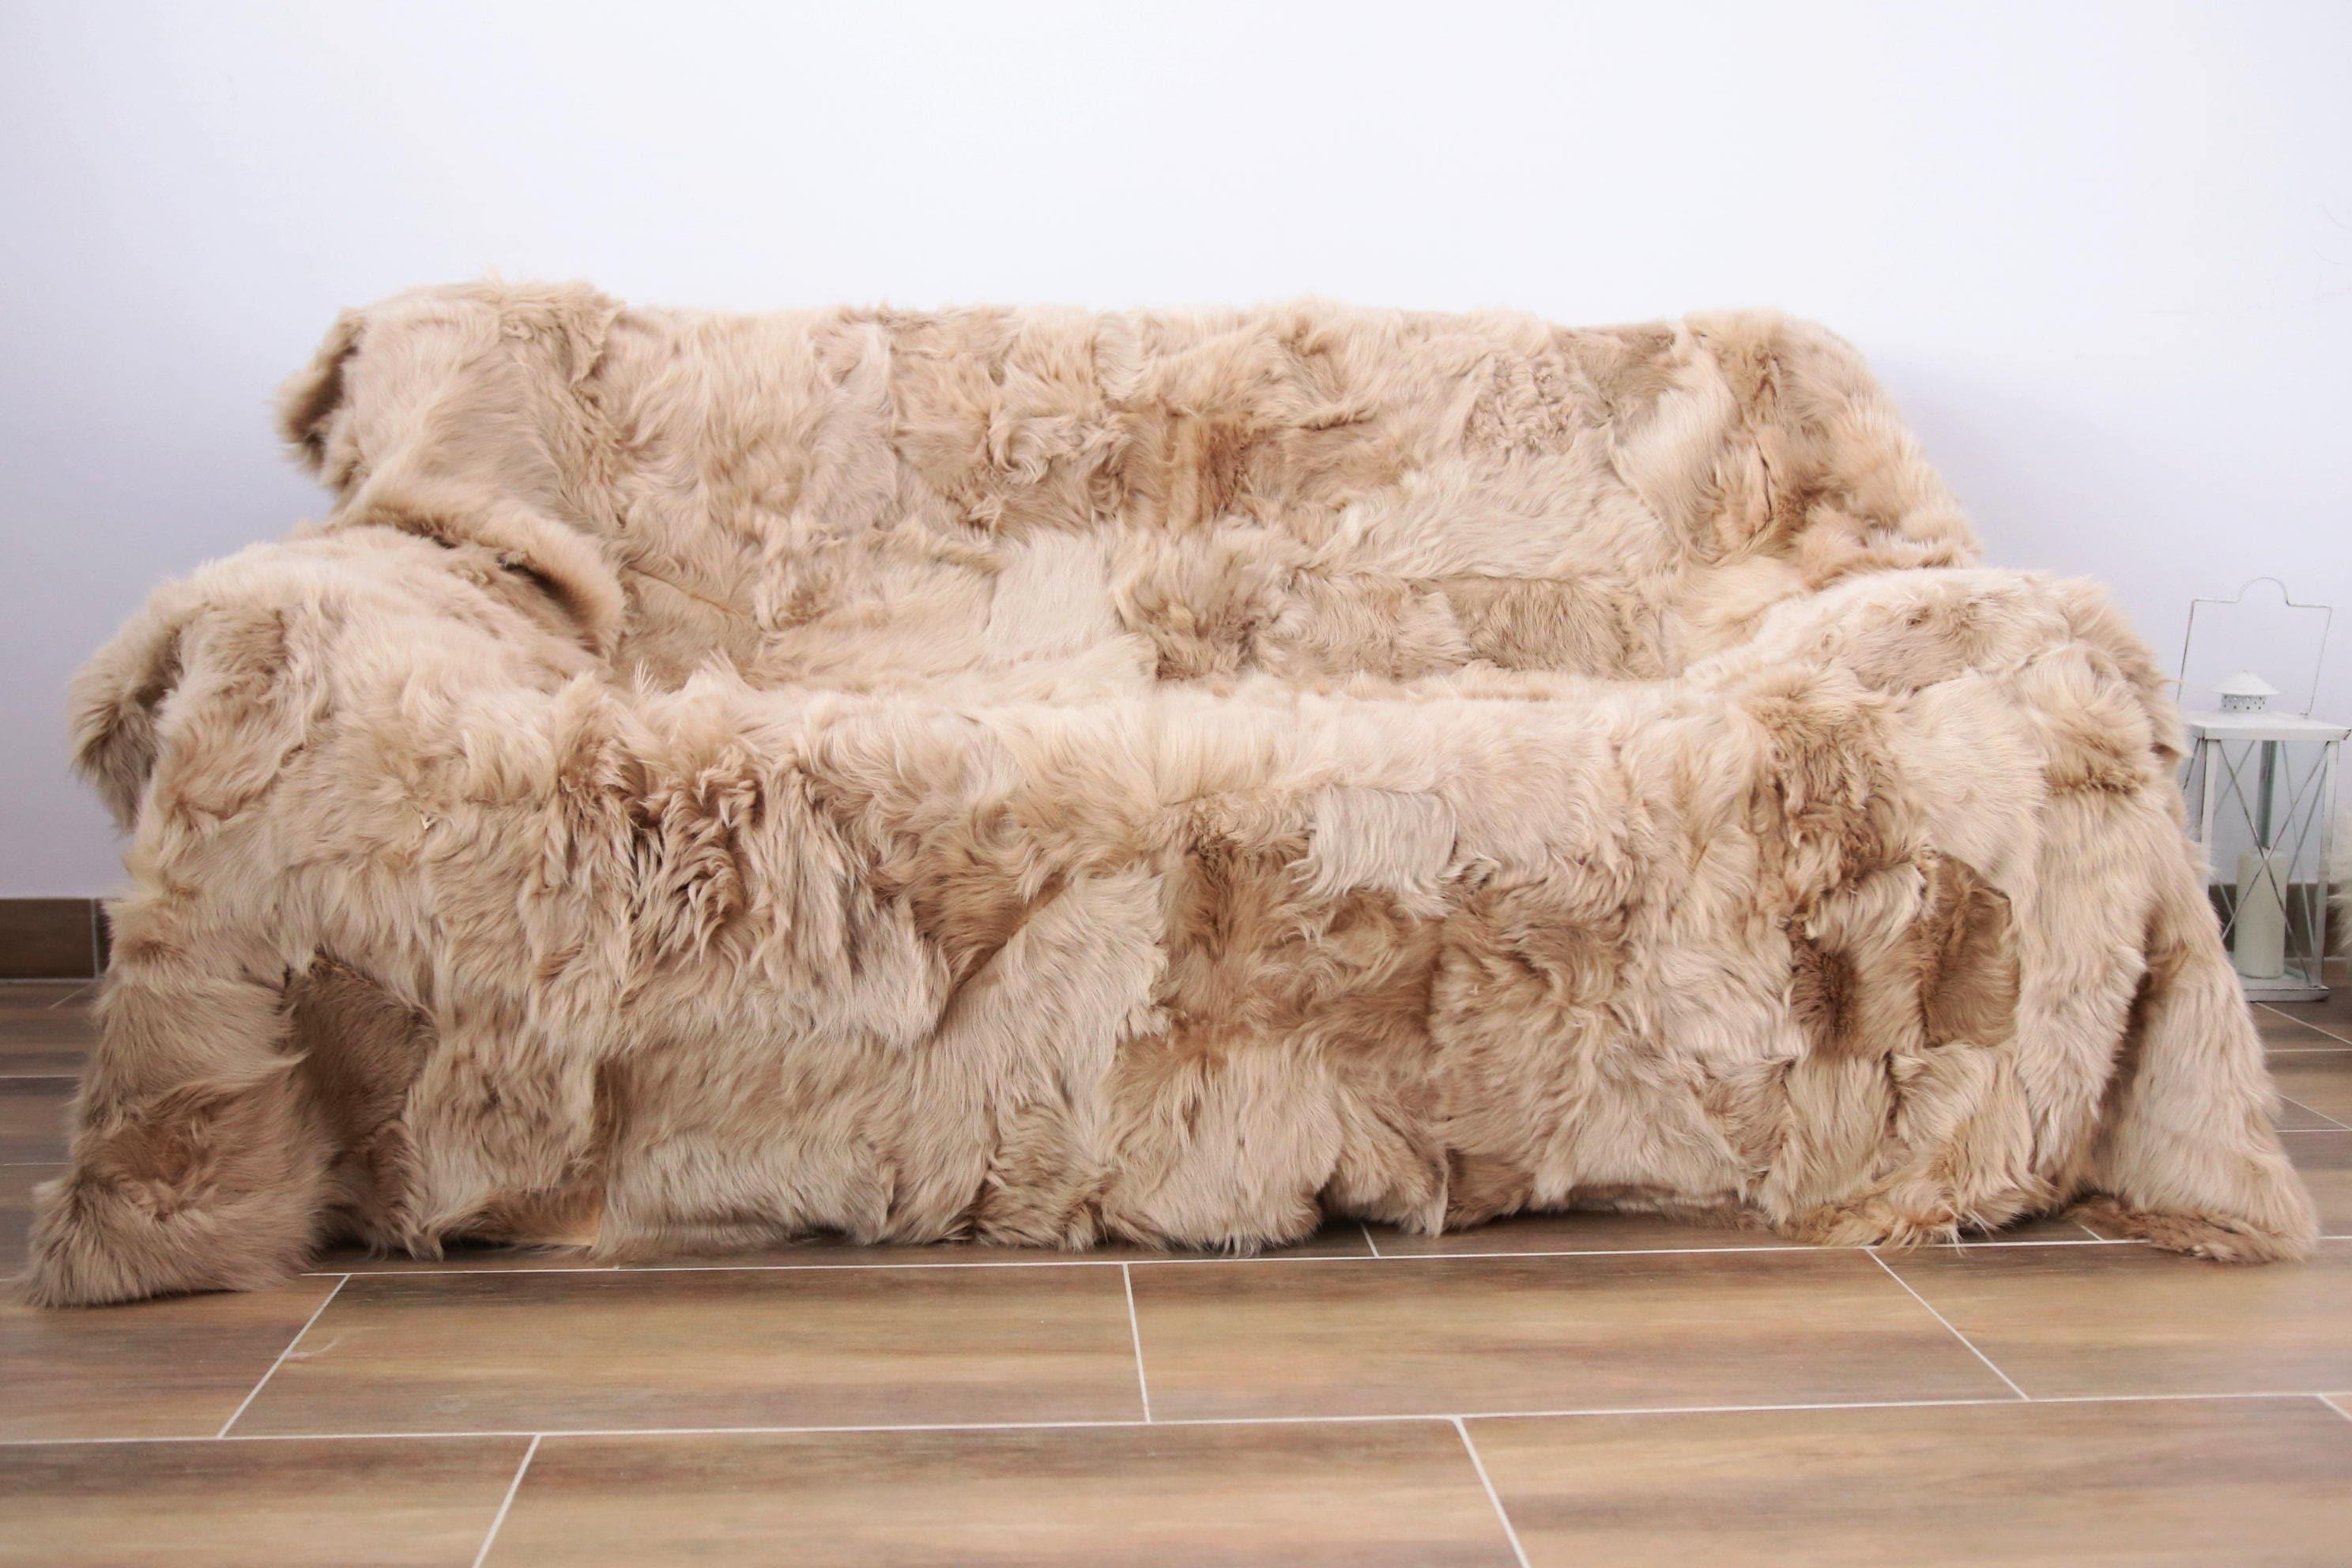 Charmant Real Sheepskin Toscana Blanket Throw, Champagne Fur Sofa Throw,  Scandinavian Decoration, Throws For Sofa, Sofa Throws, Luxury Throws